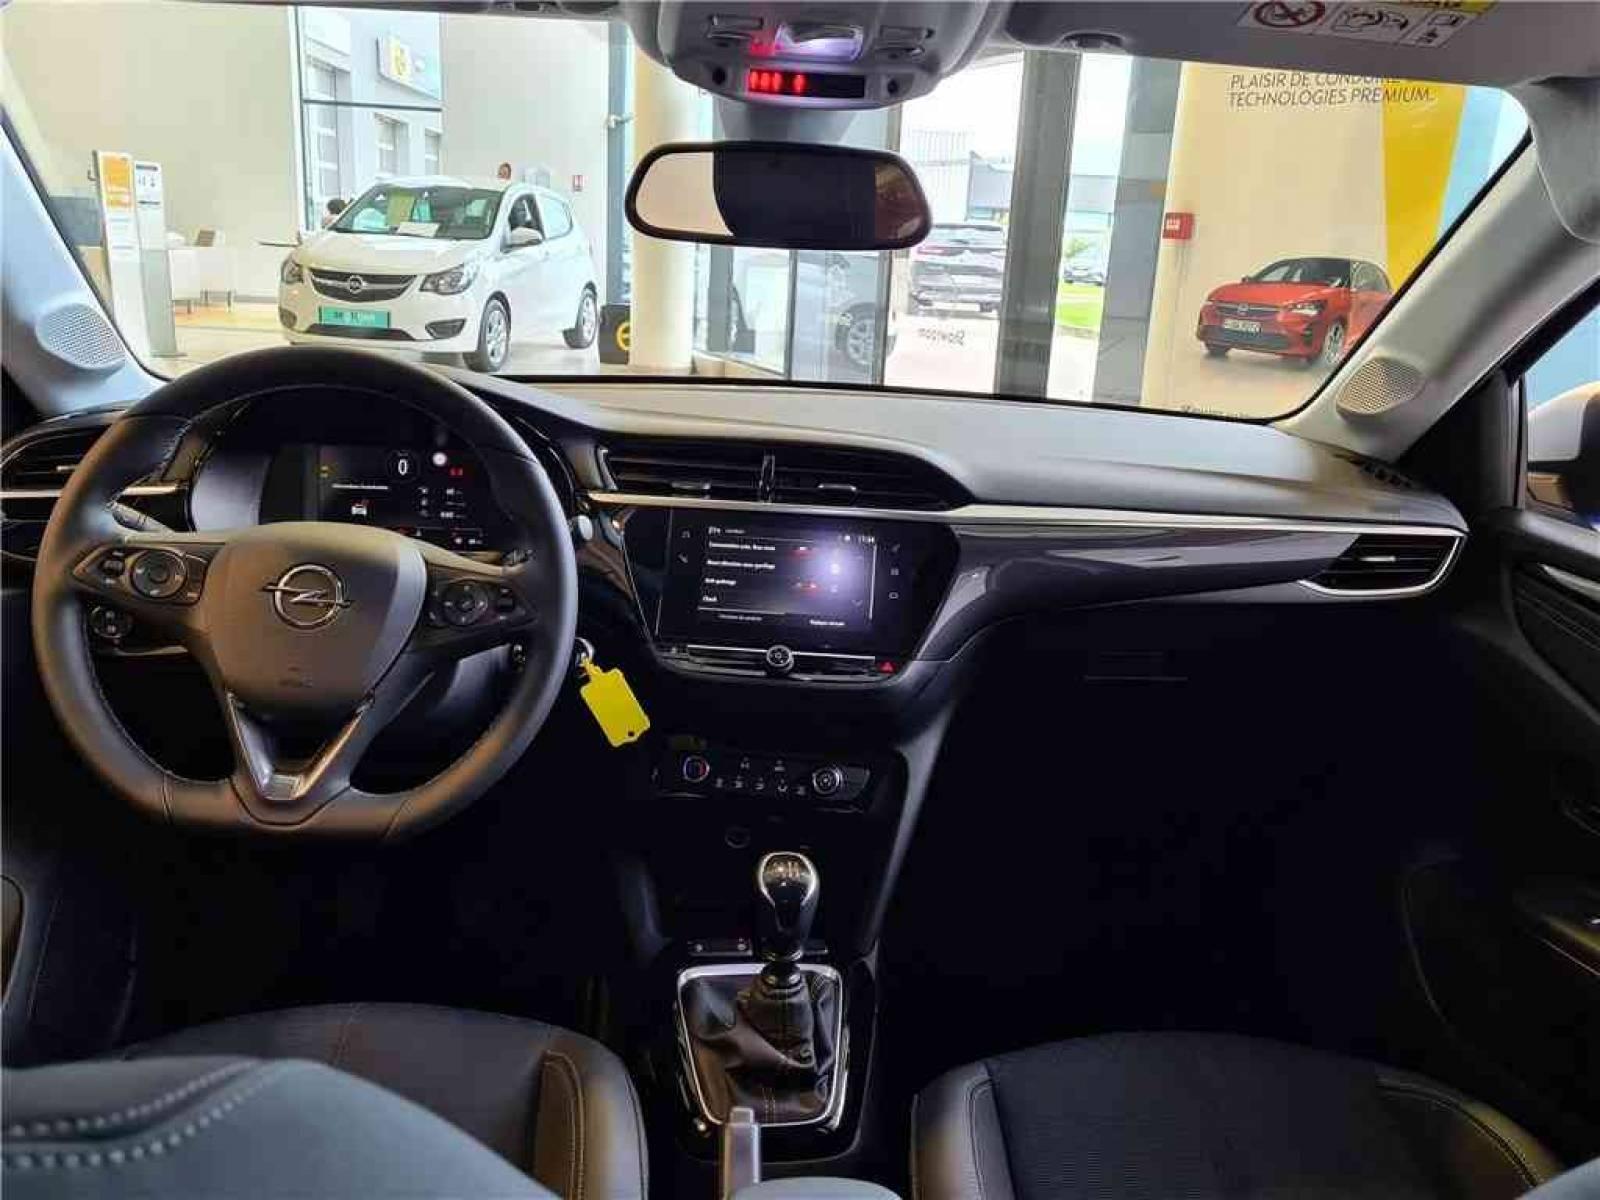 OPEL Corsa 1.2 Turbo 100 ch BVM6 - véhicule d'occasion - Groupe Guillet - Opel Magicauto - Chalon-sur-Saône - 71380 - Saint-Marcel - 24